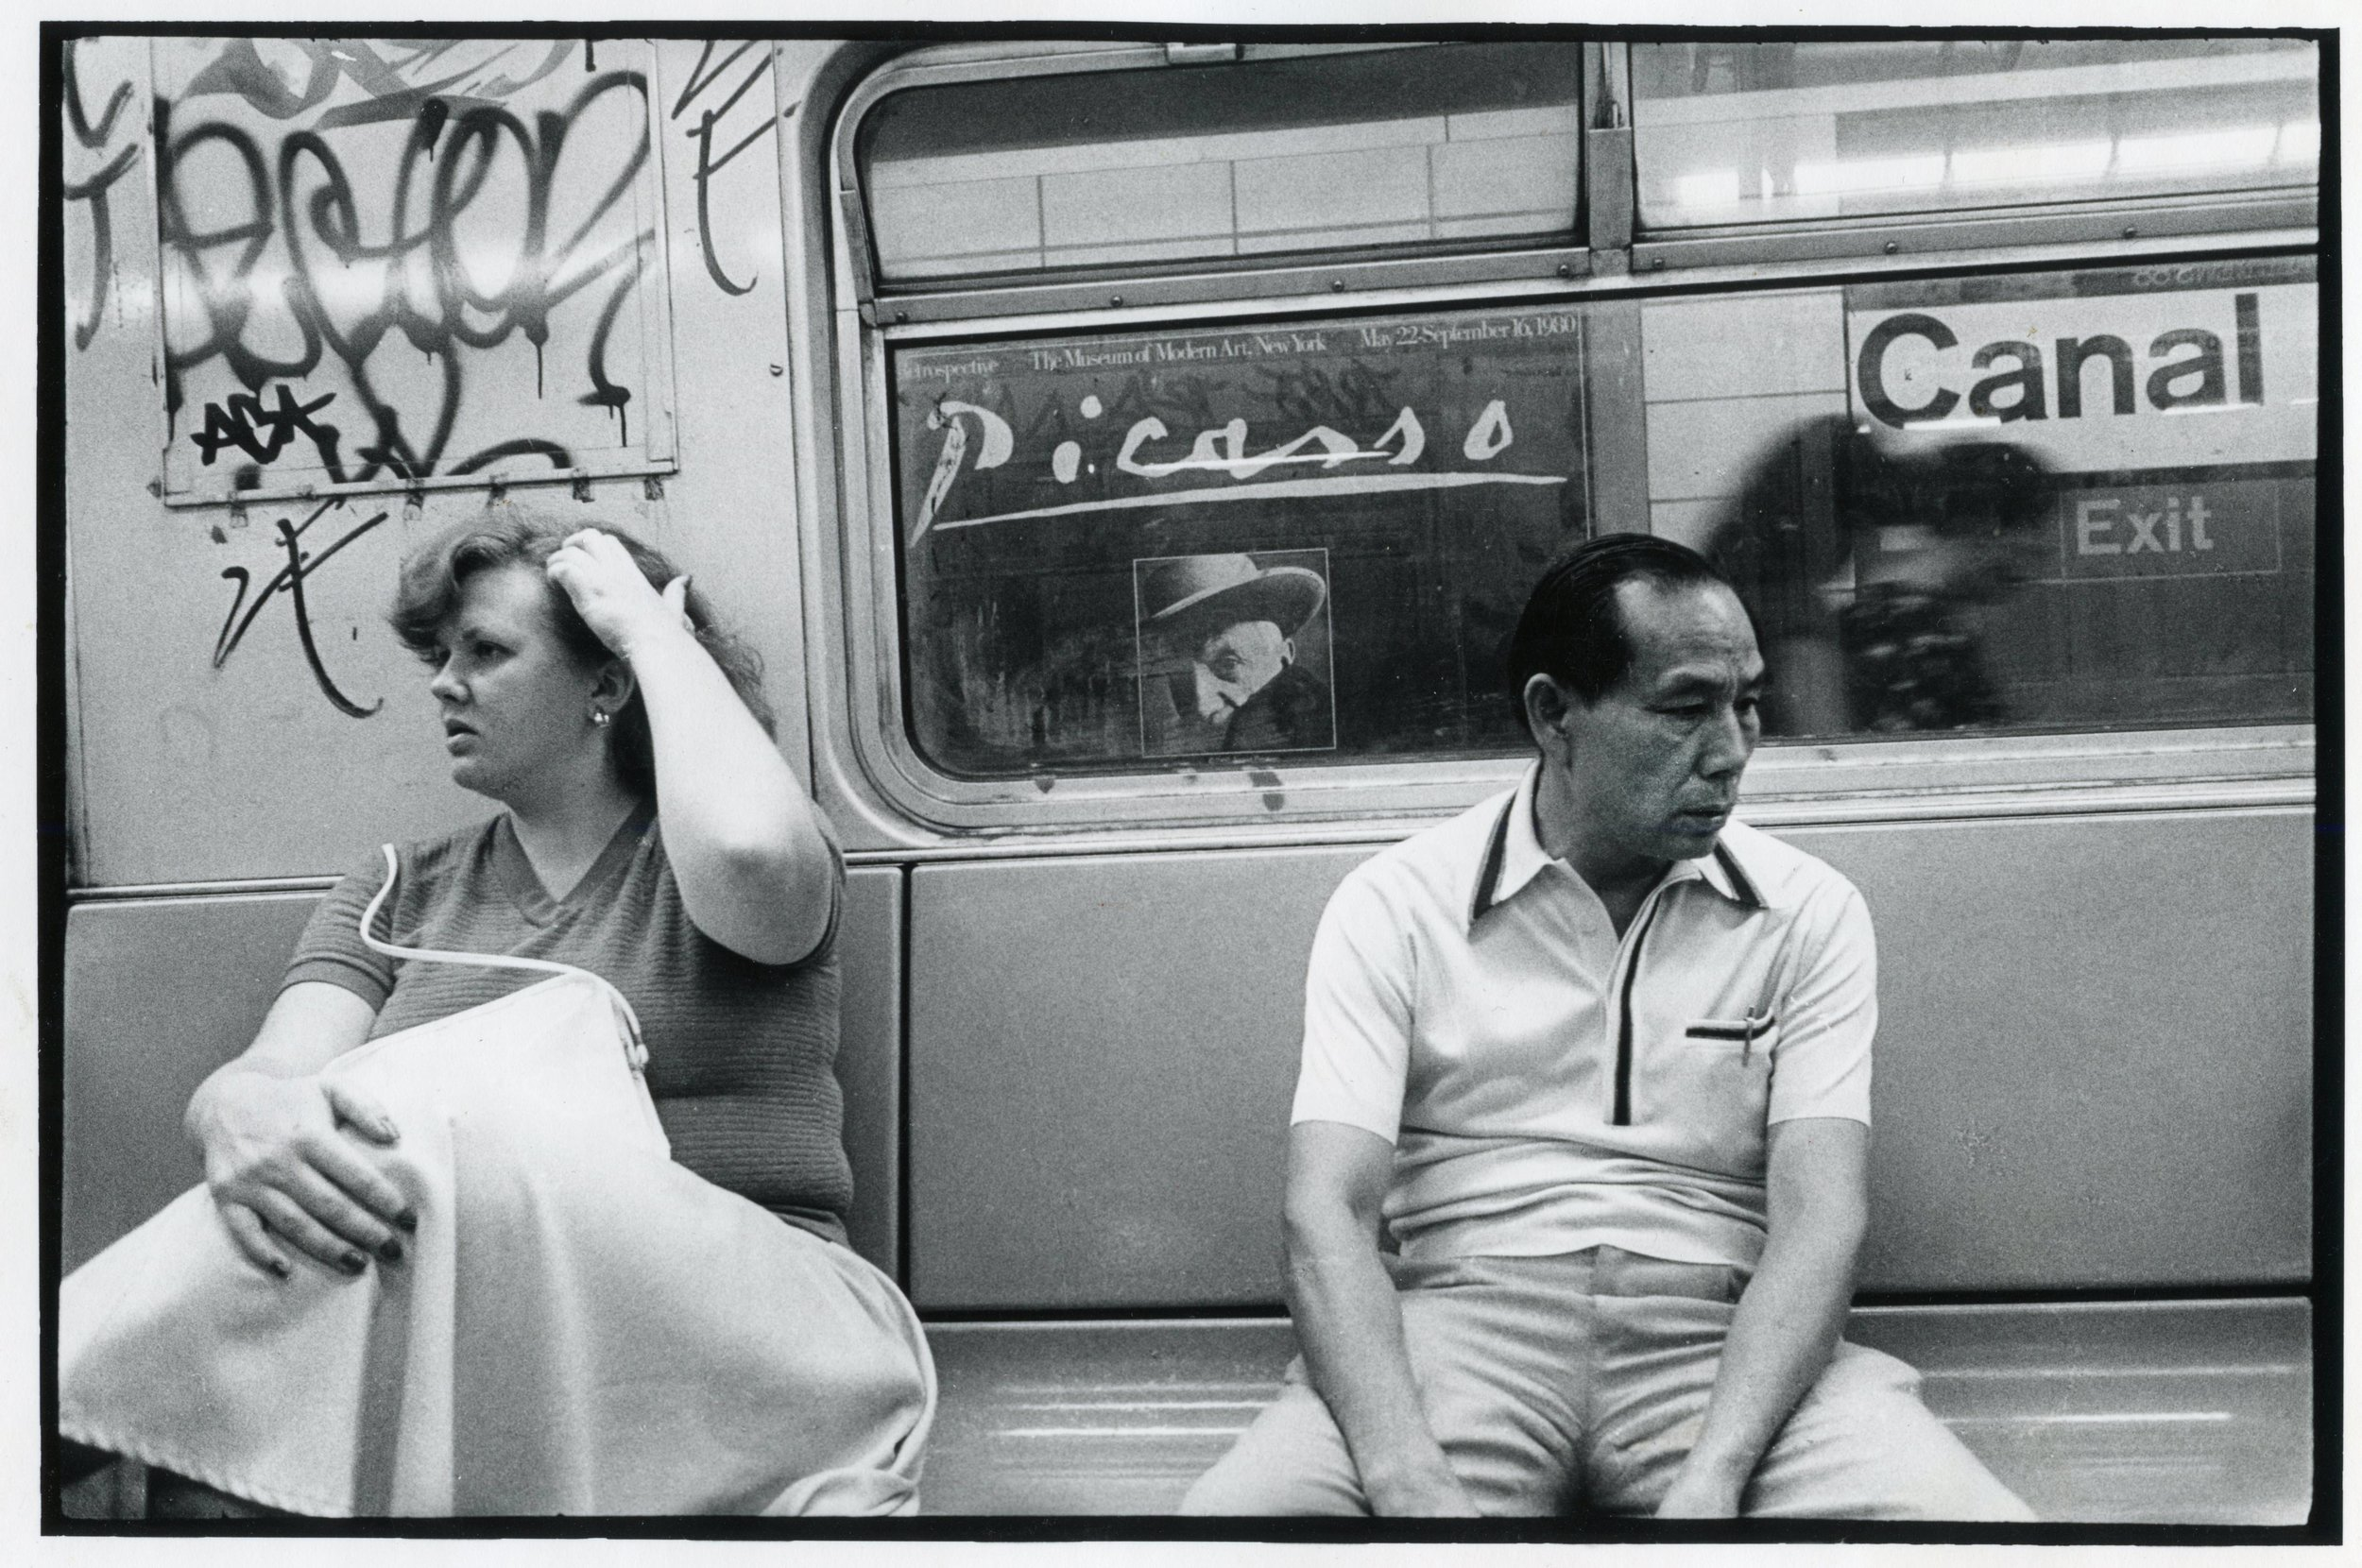 Picasso Subway, New York 1980